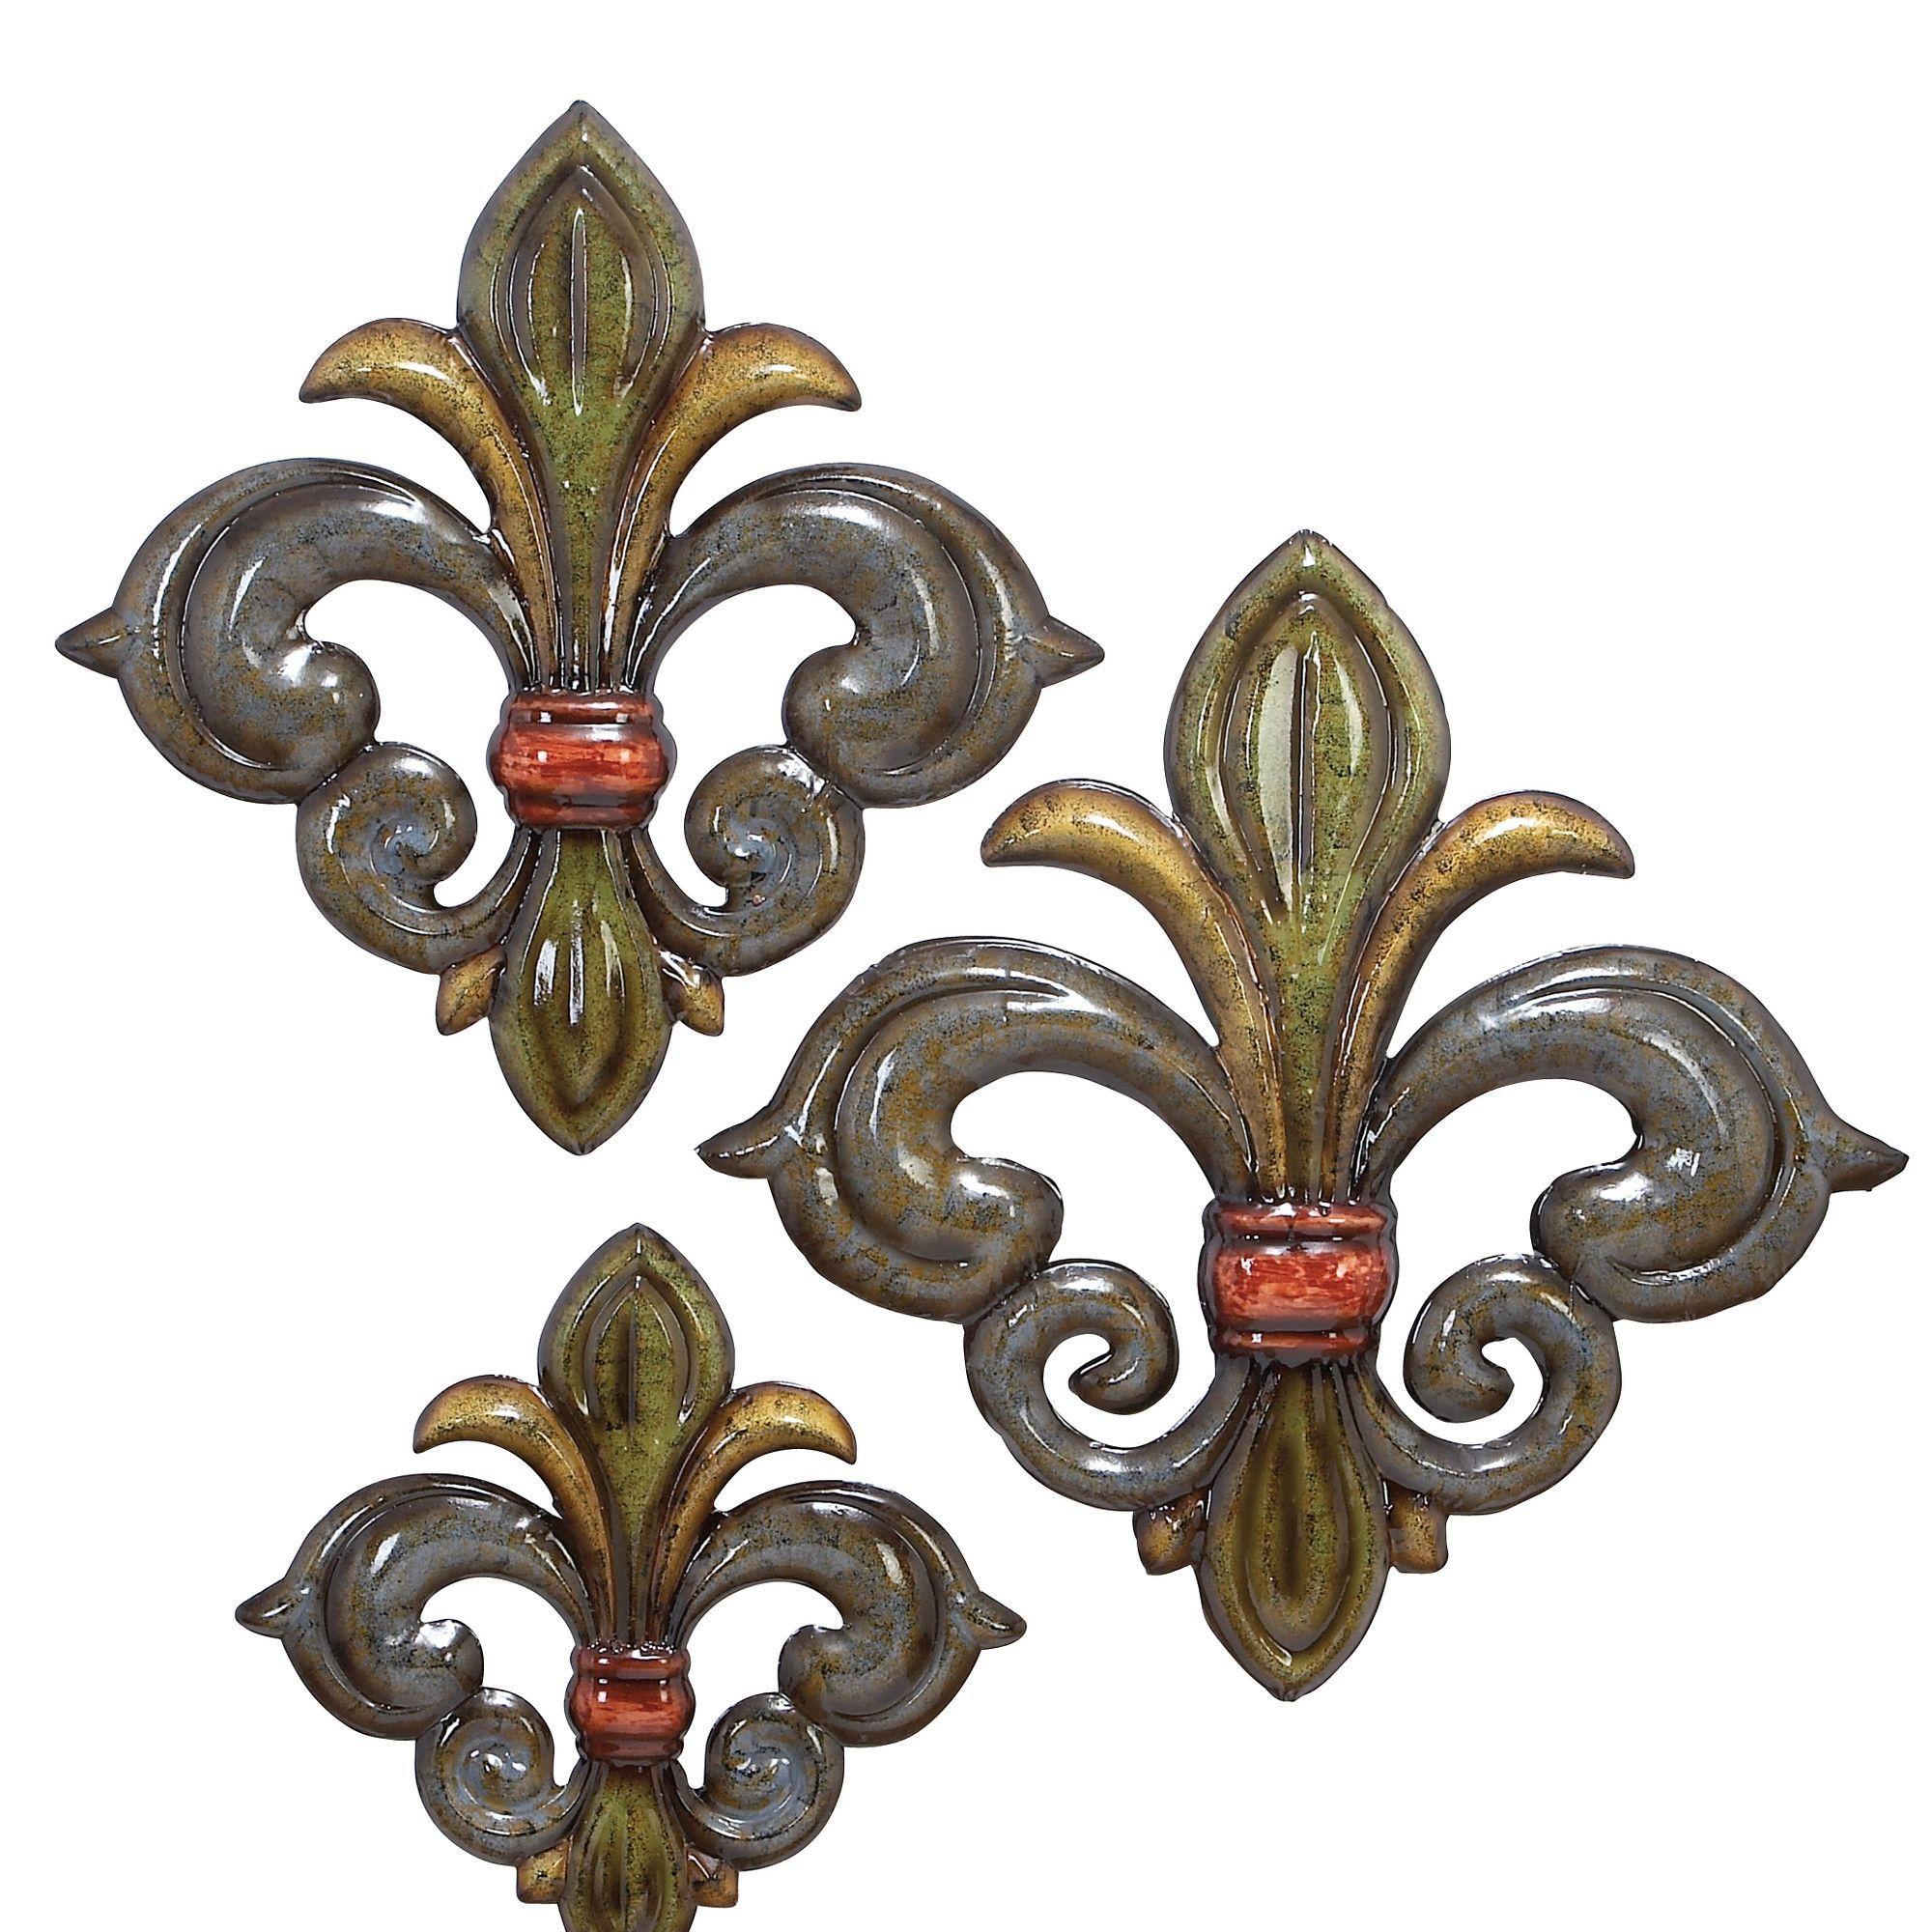 3 Piece Metal Fleur De Lis Wall Decor Set